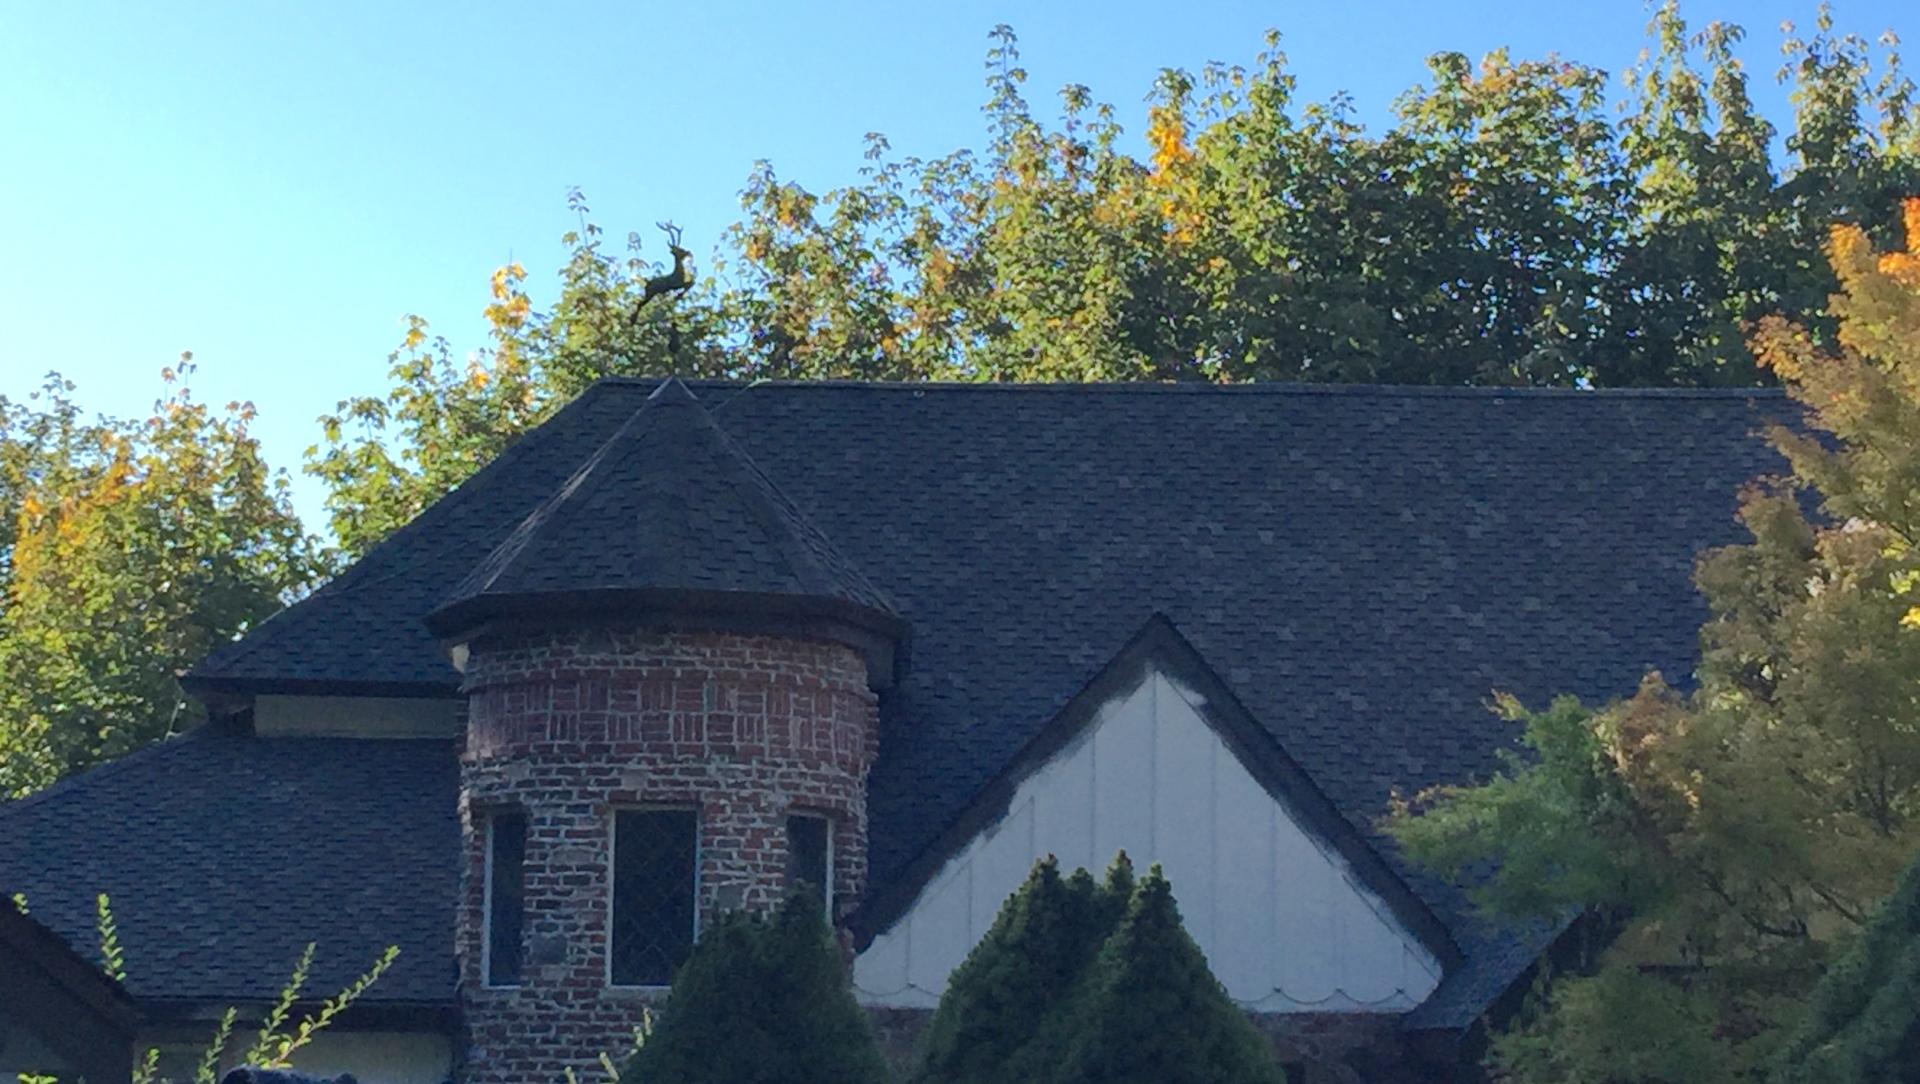 Roofing Company Gig Harbor, WA